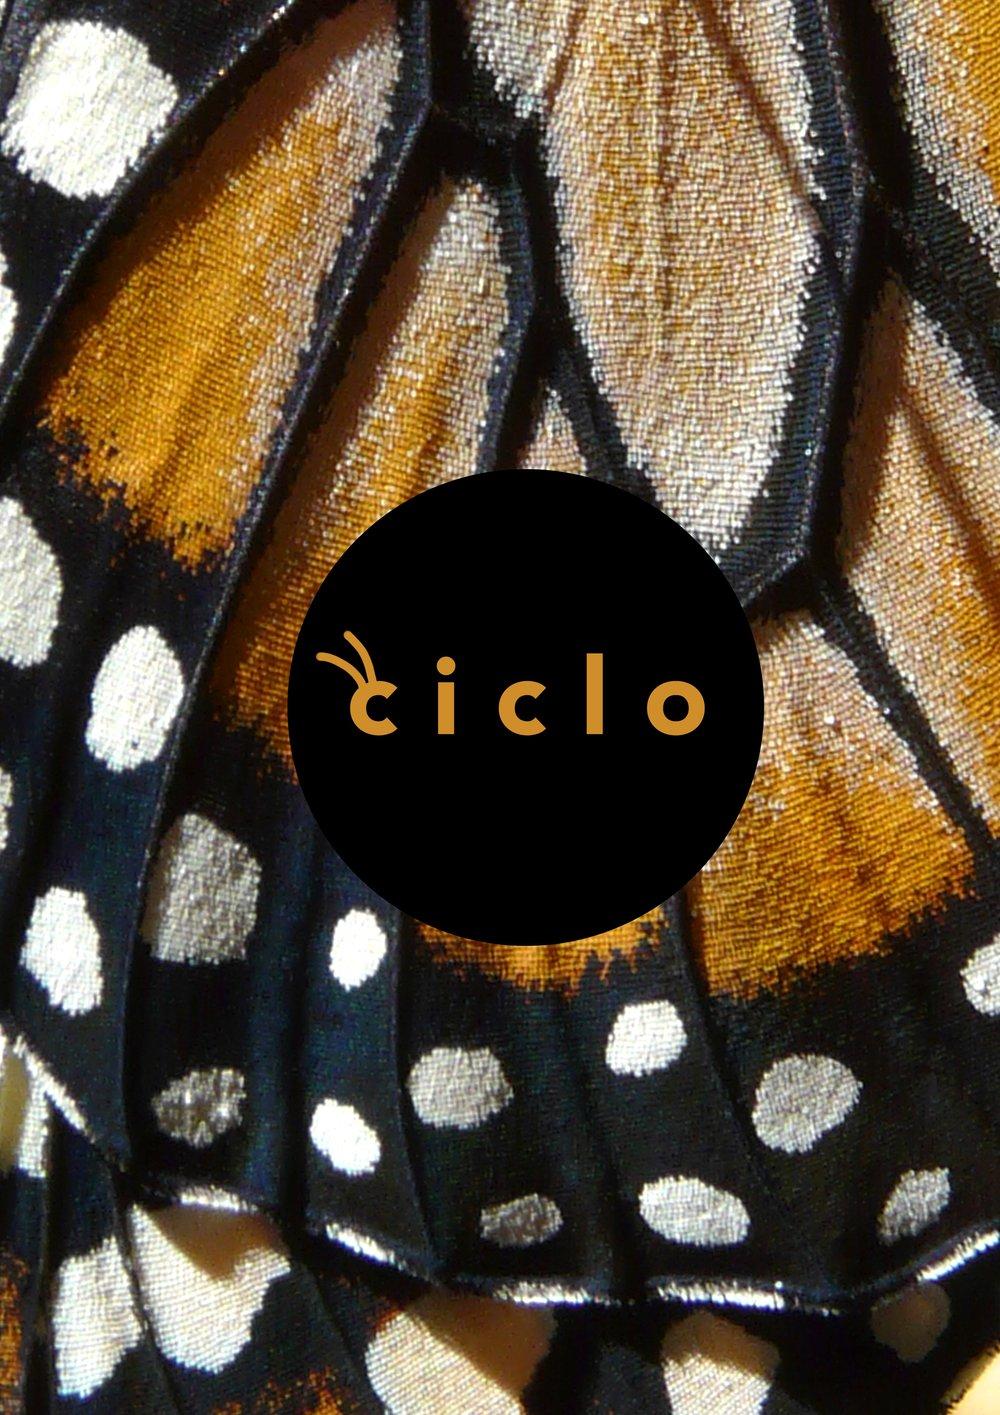 Ciclo_Posters_03.jpg